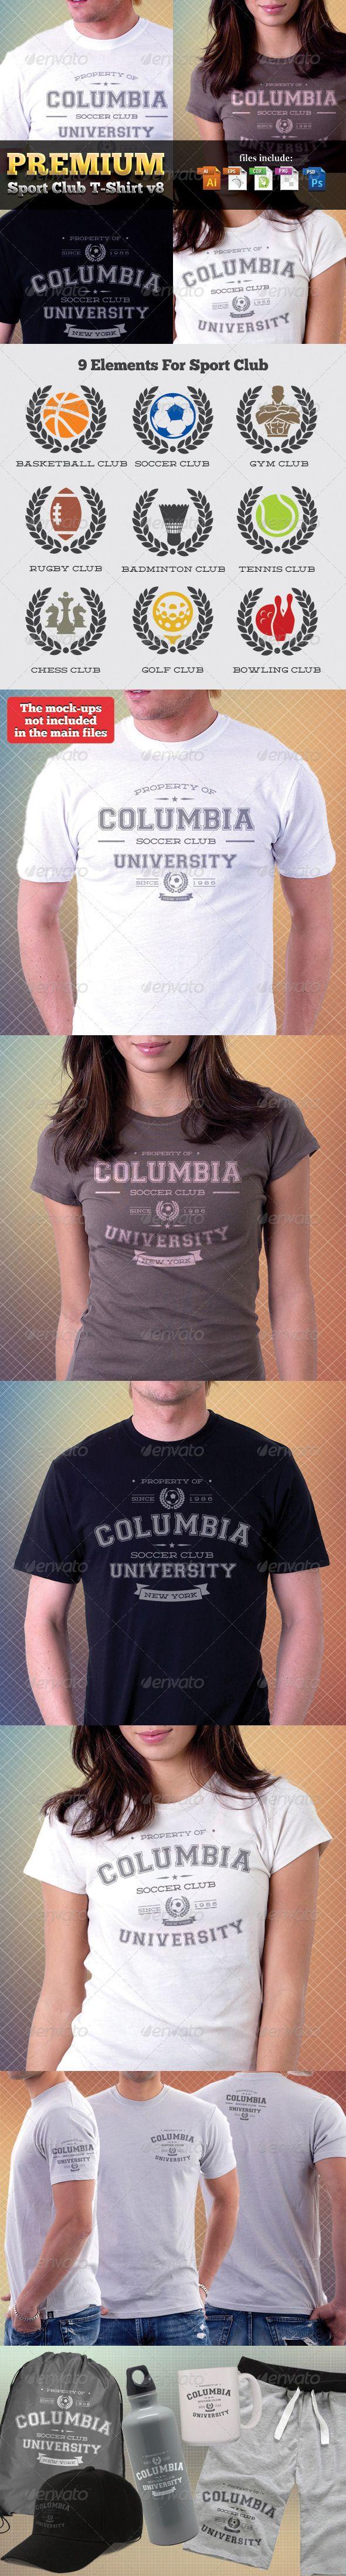 premium sport clubs t shirts templates v8 shirt template trendy tshirts custom tshirt design pinterest